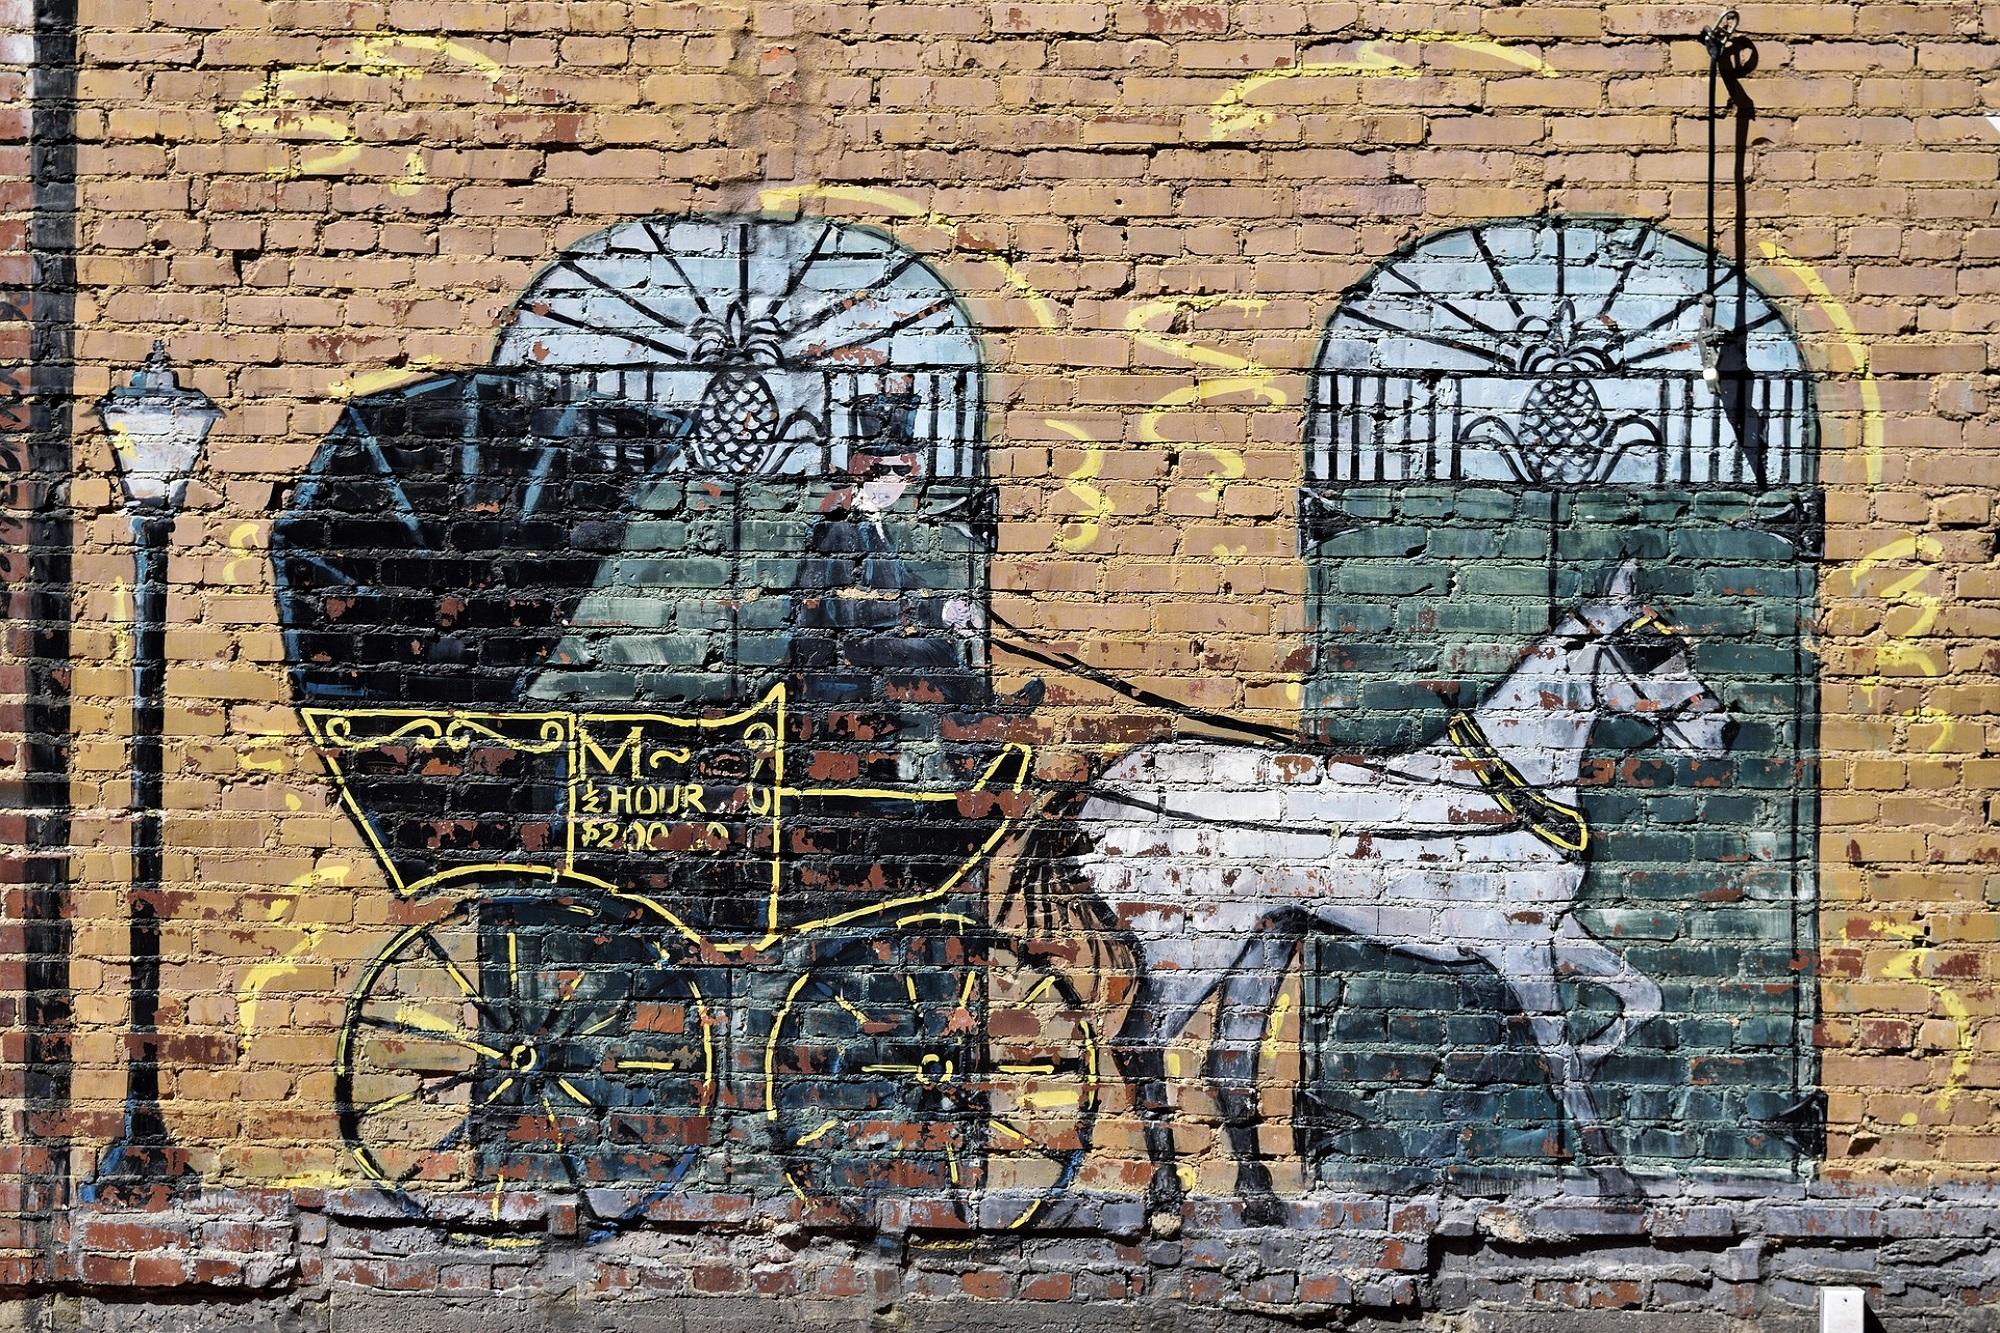 wall-mural-2292838_1920